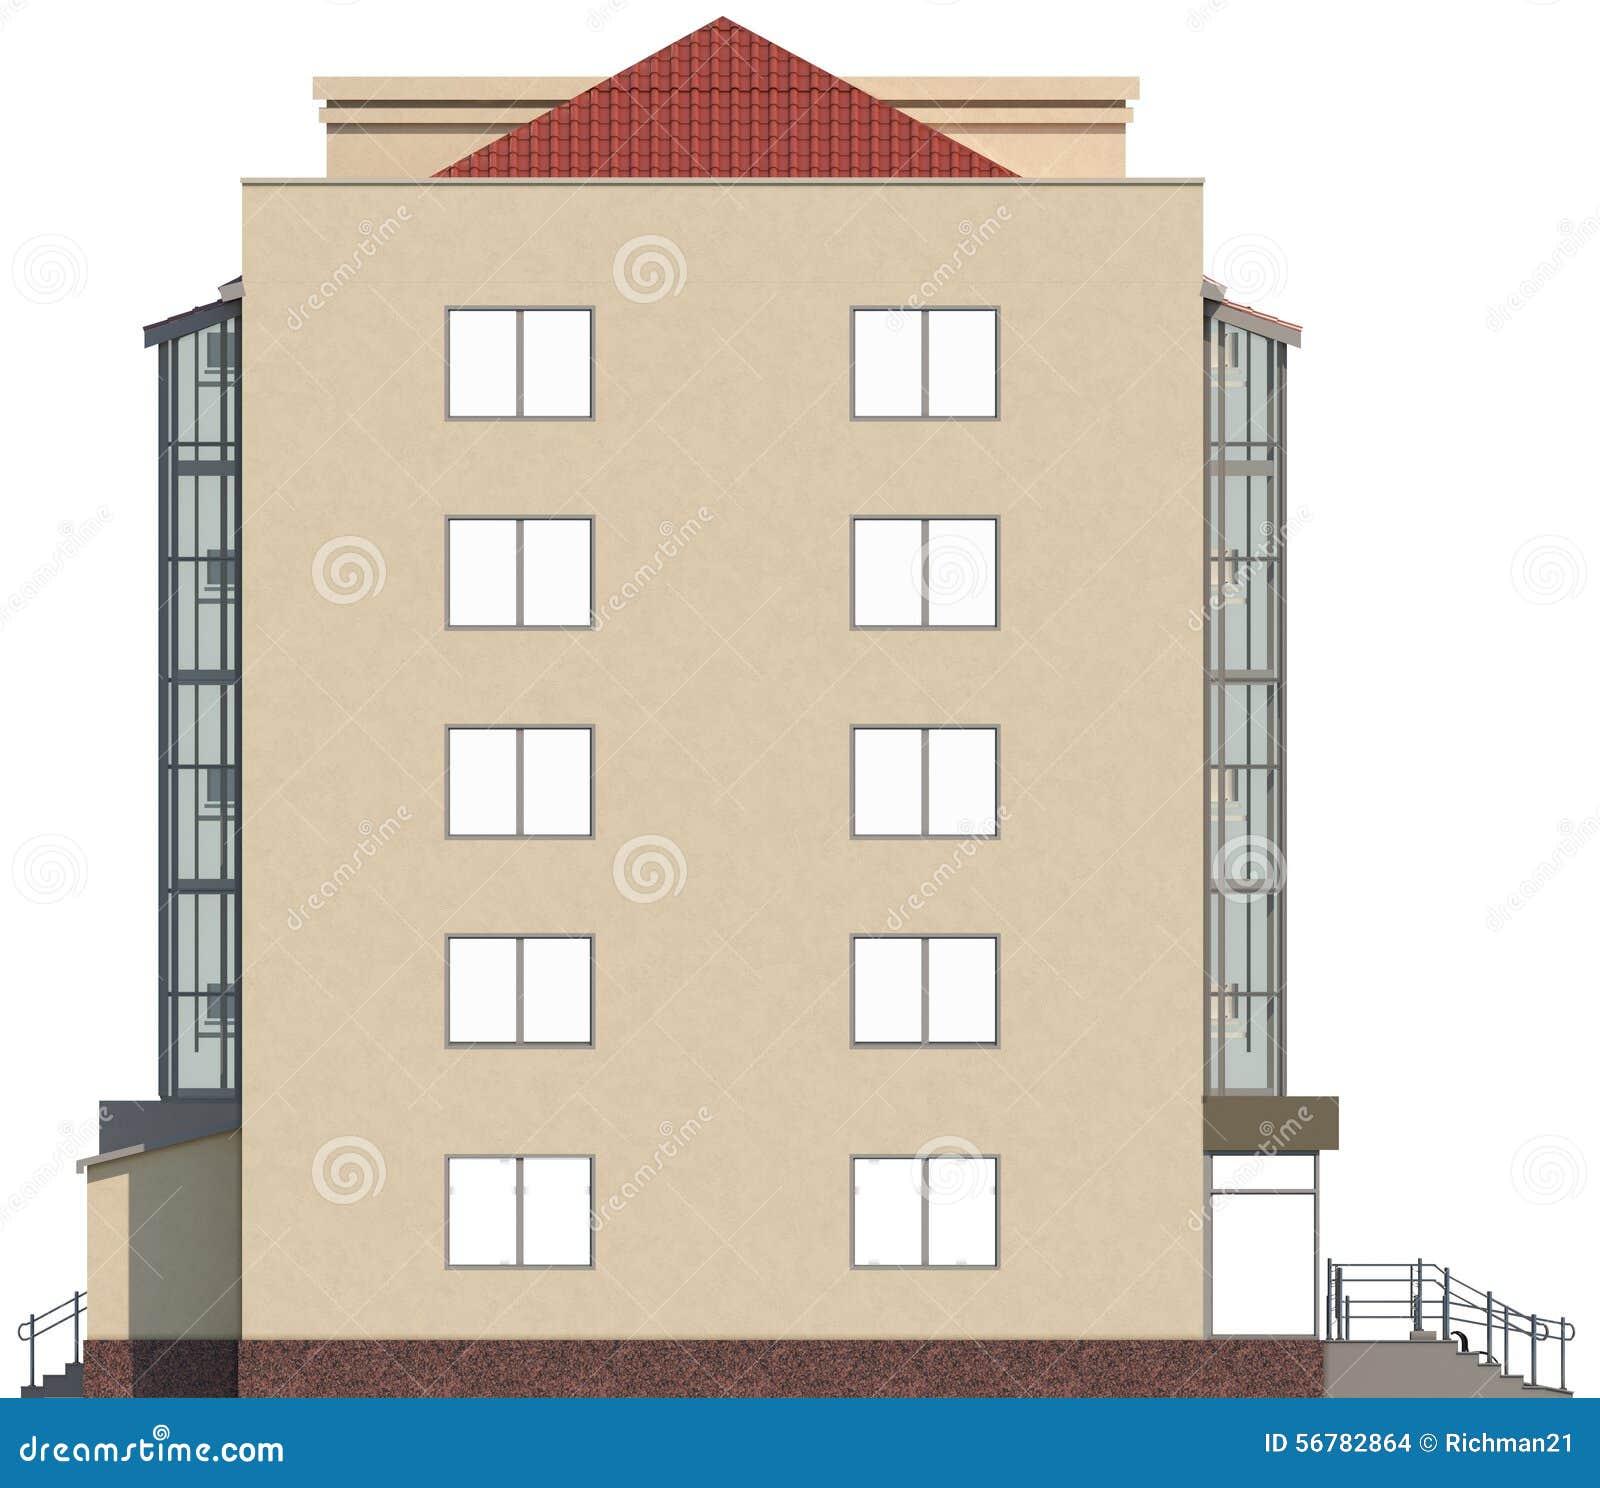 Couleur facade maison cupastone lisers modnatures for Couleur facade tendance